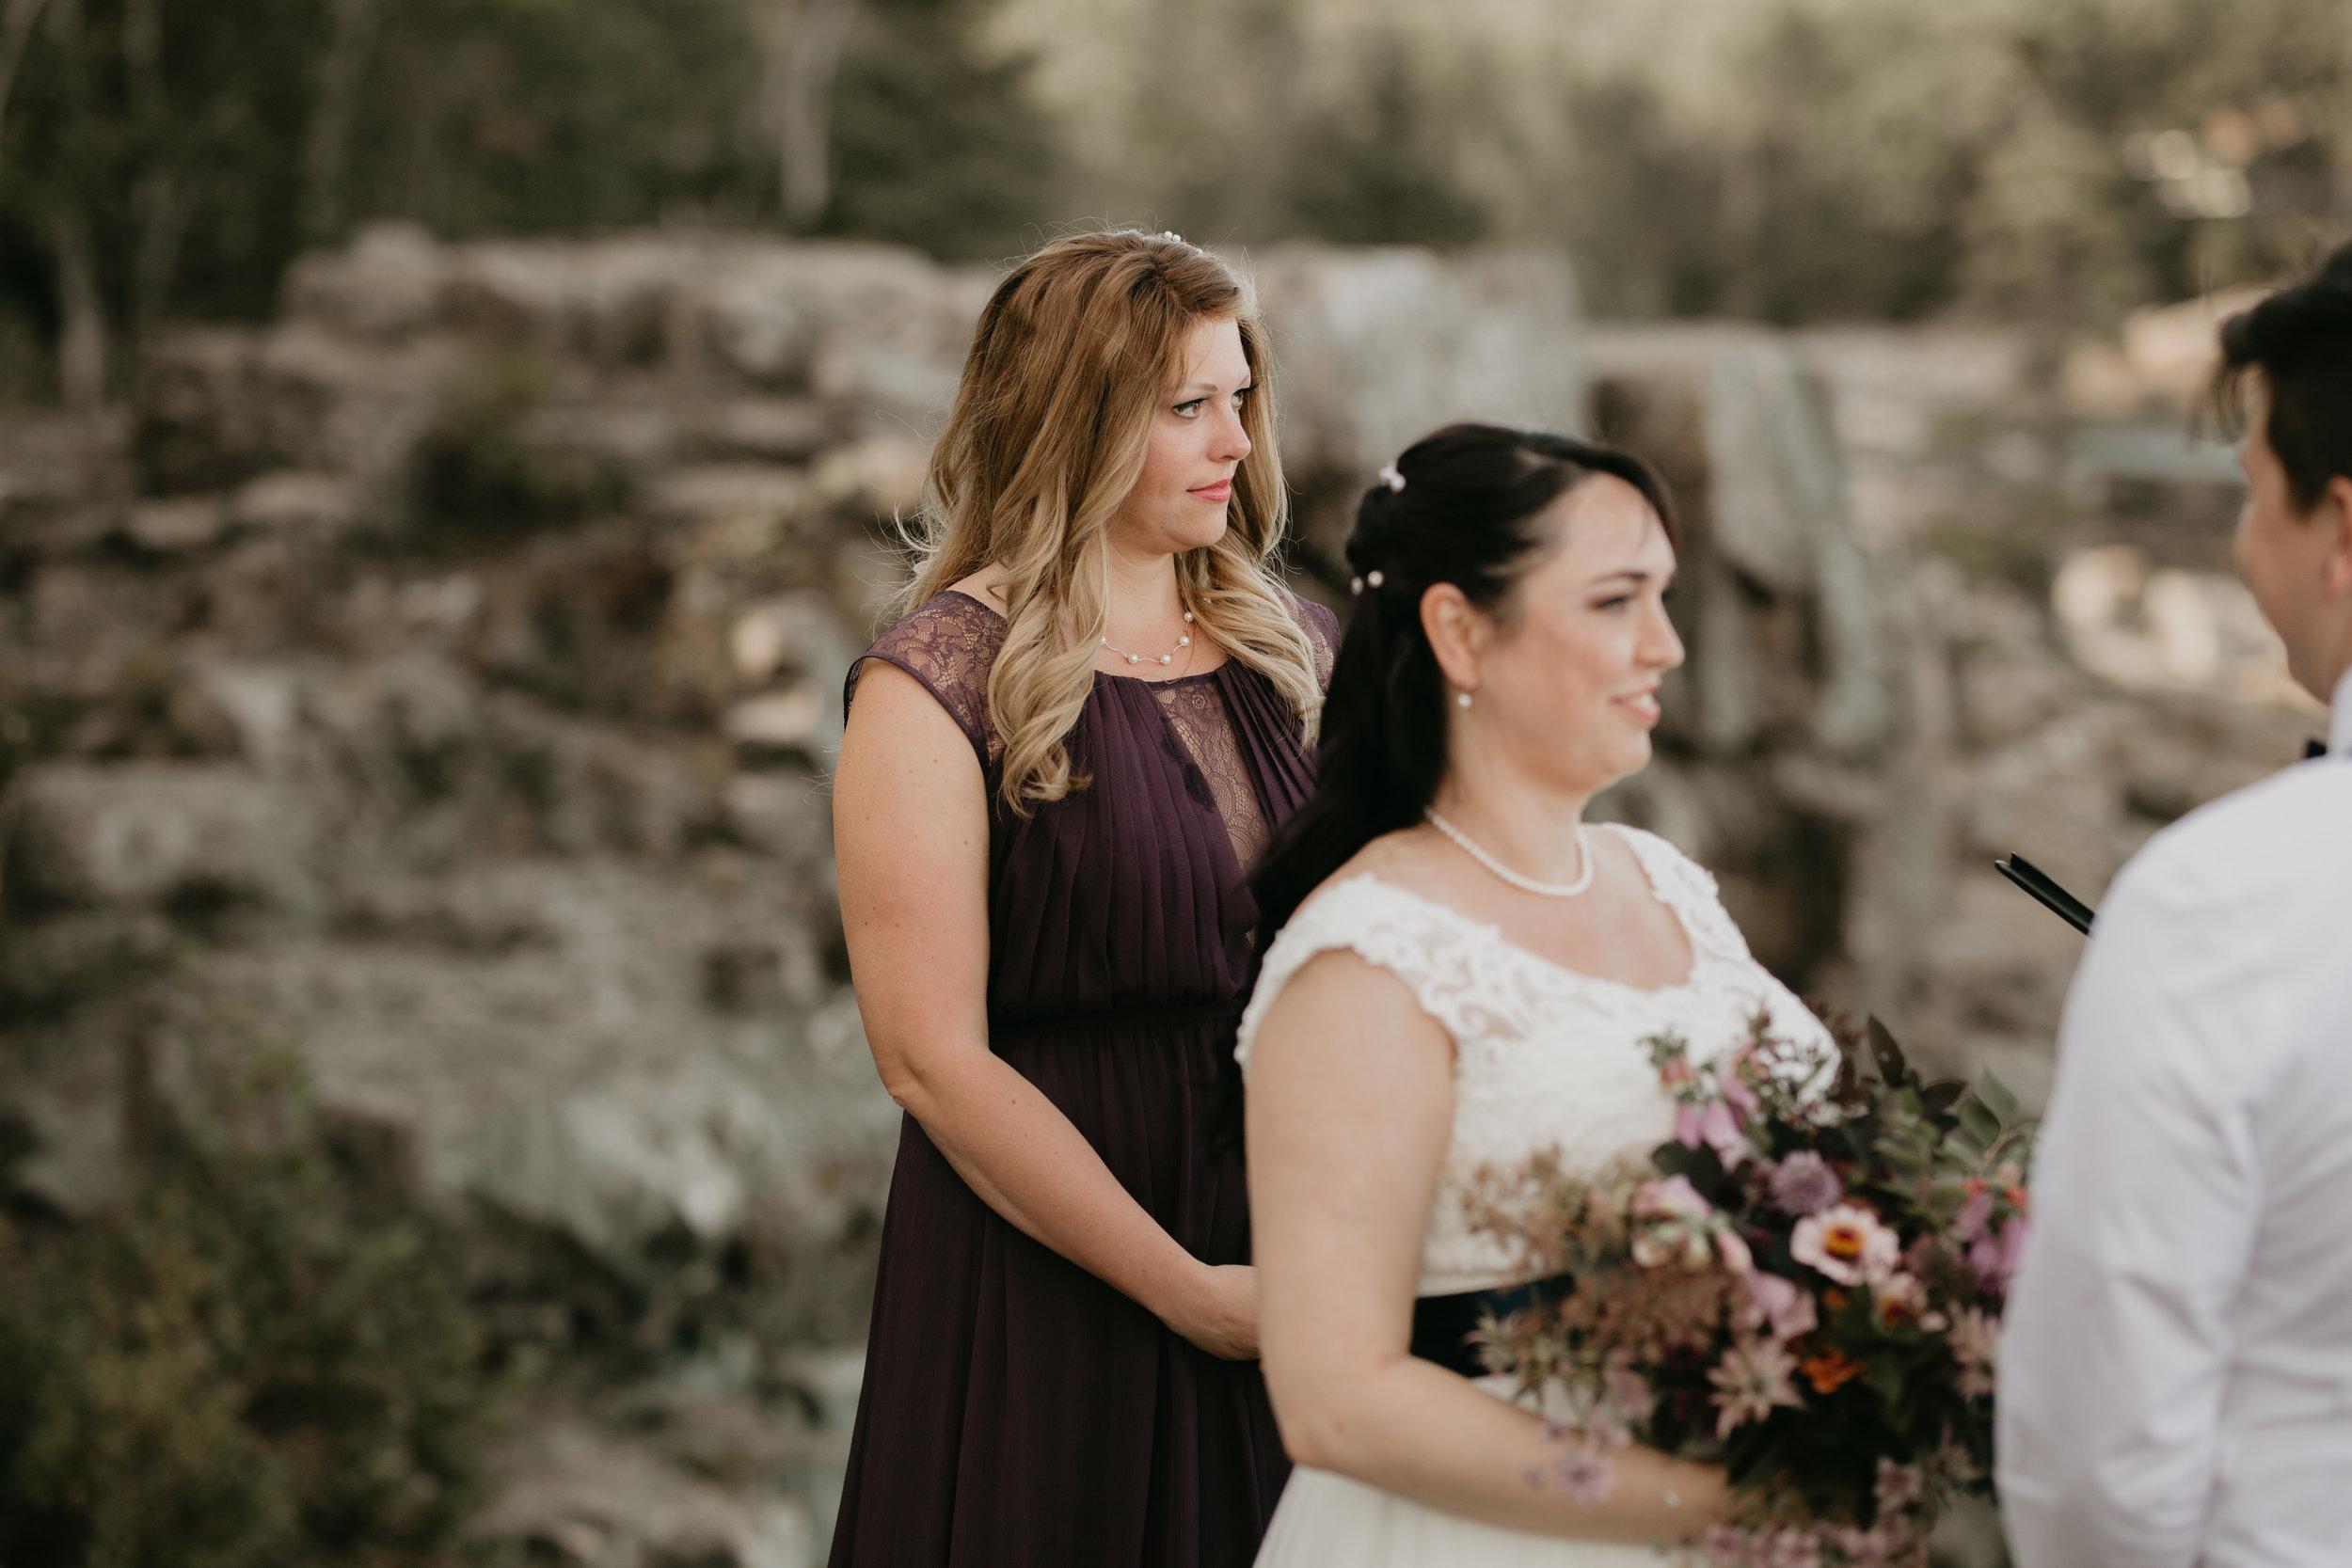 nicole-daacke-photography-Elopement-rocky-shoreline-coast-Acadia-National-Park-elopement-photographer-inspiration-maine-elopement-otter-cliffs-schoonic-head-point-17.jpg